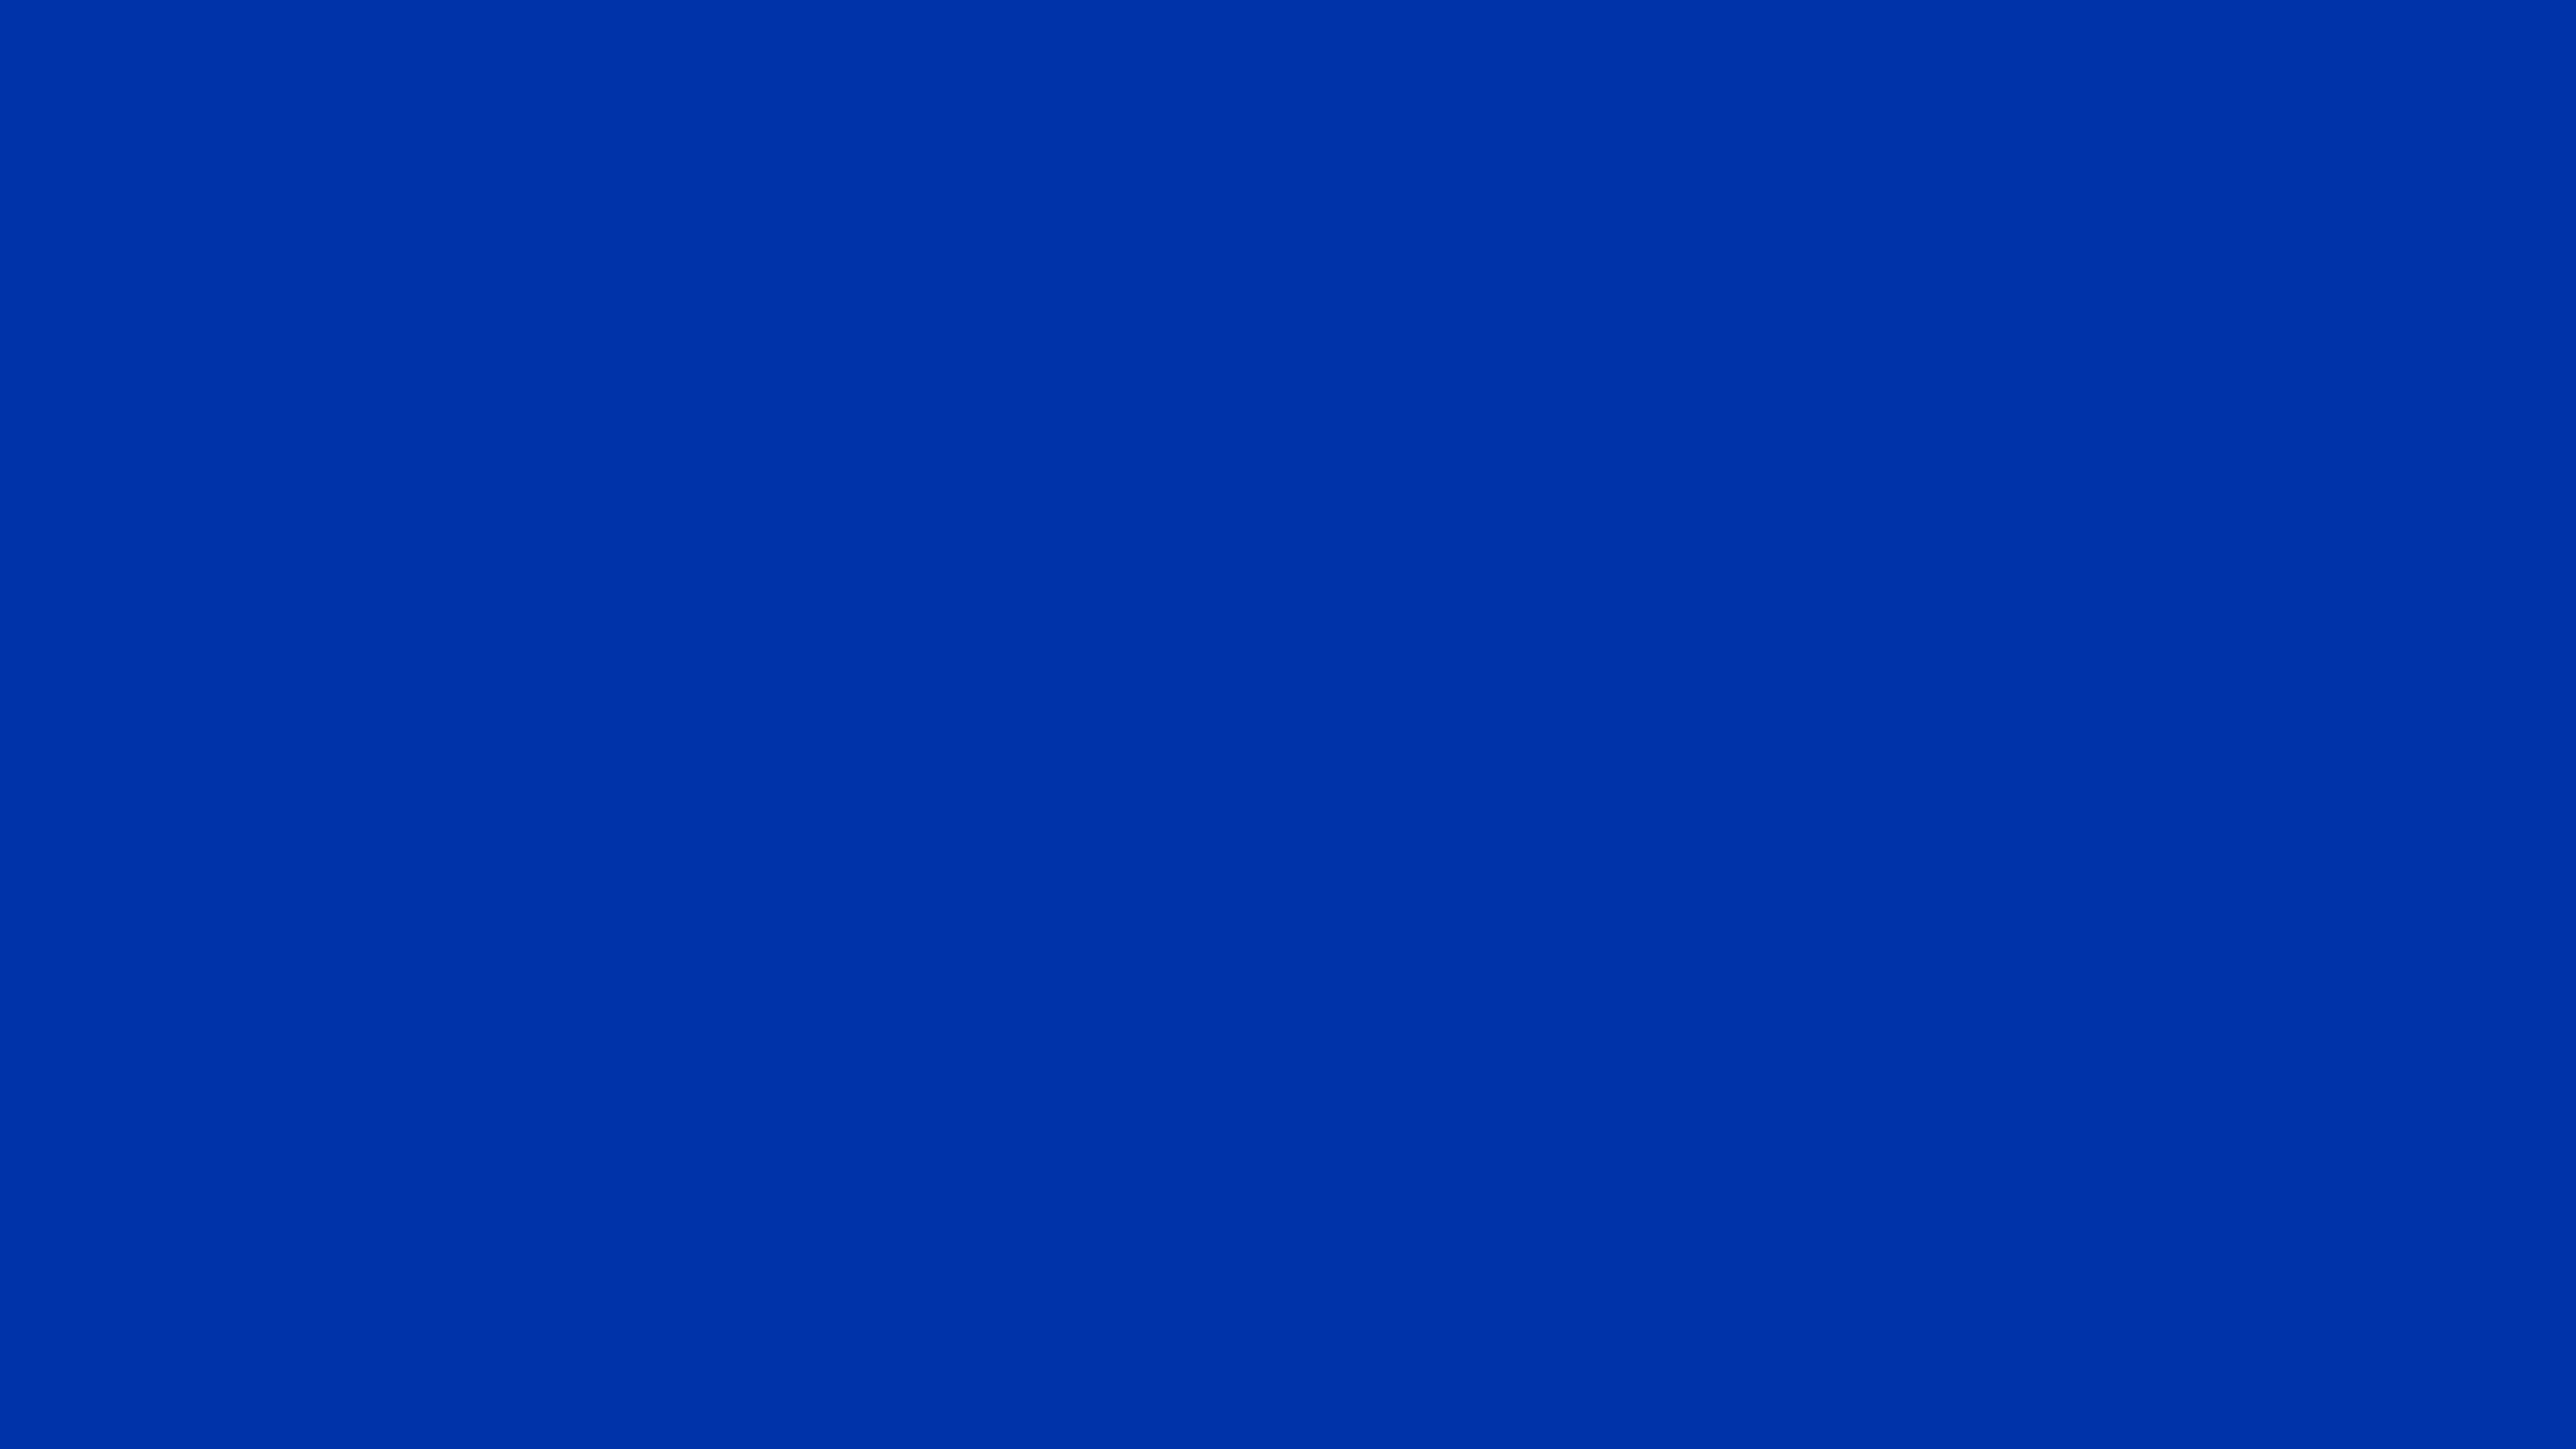 3840x2160 UA Blue Solid Color Background